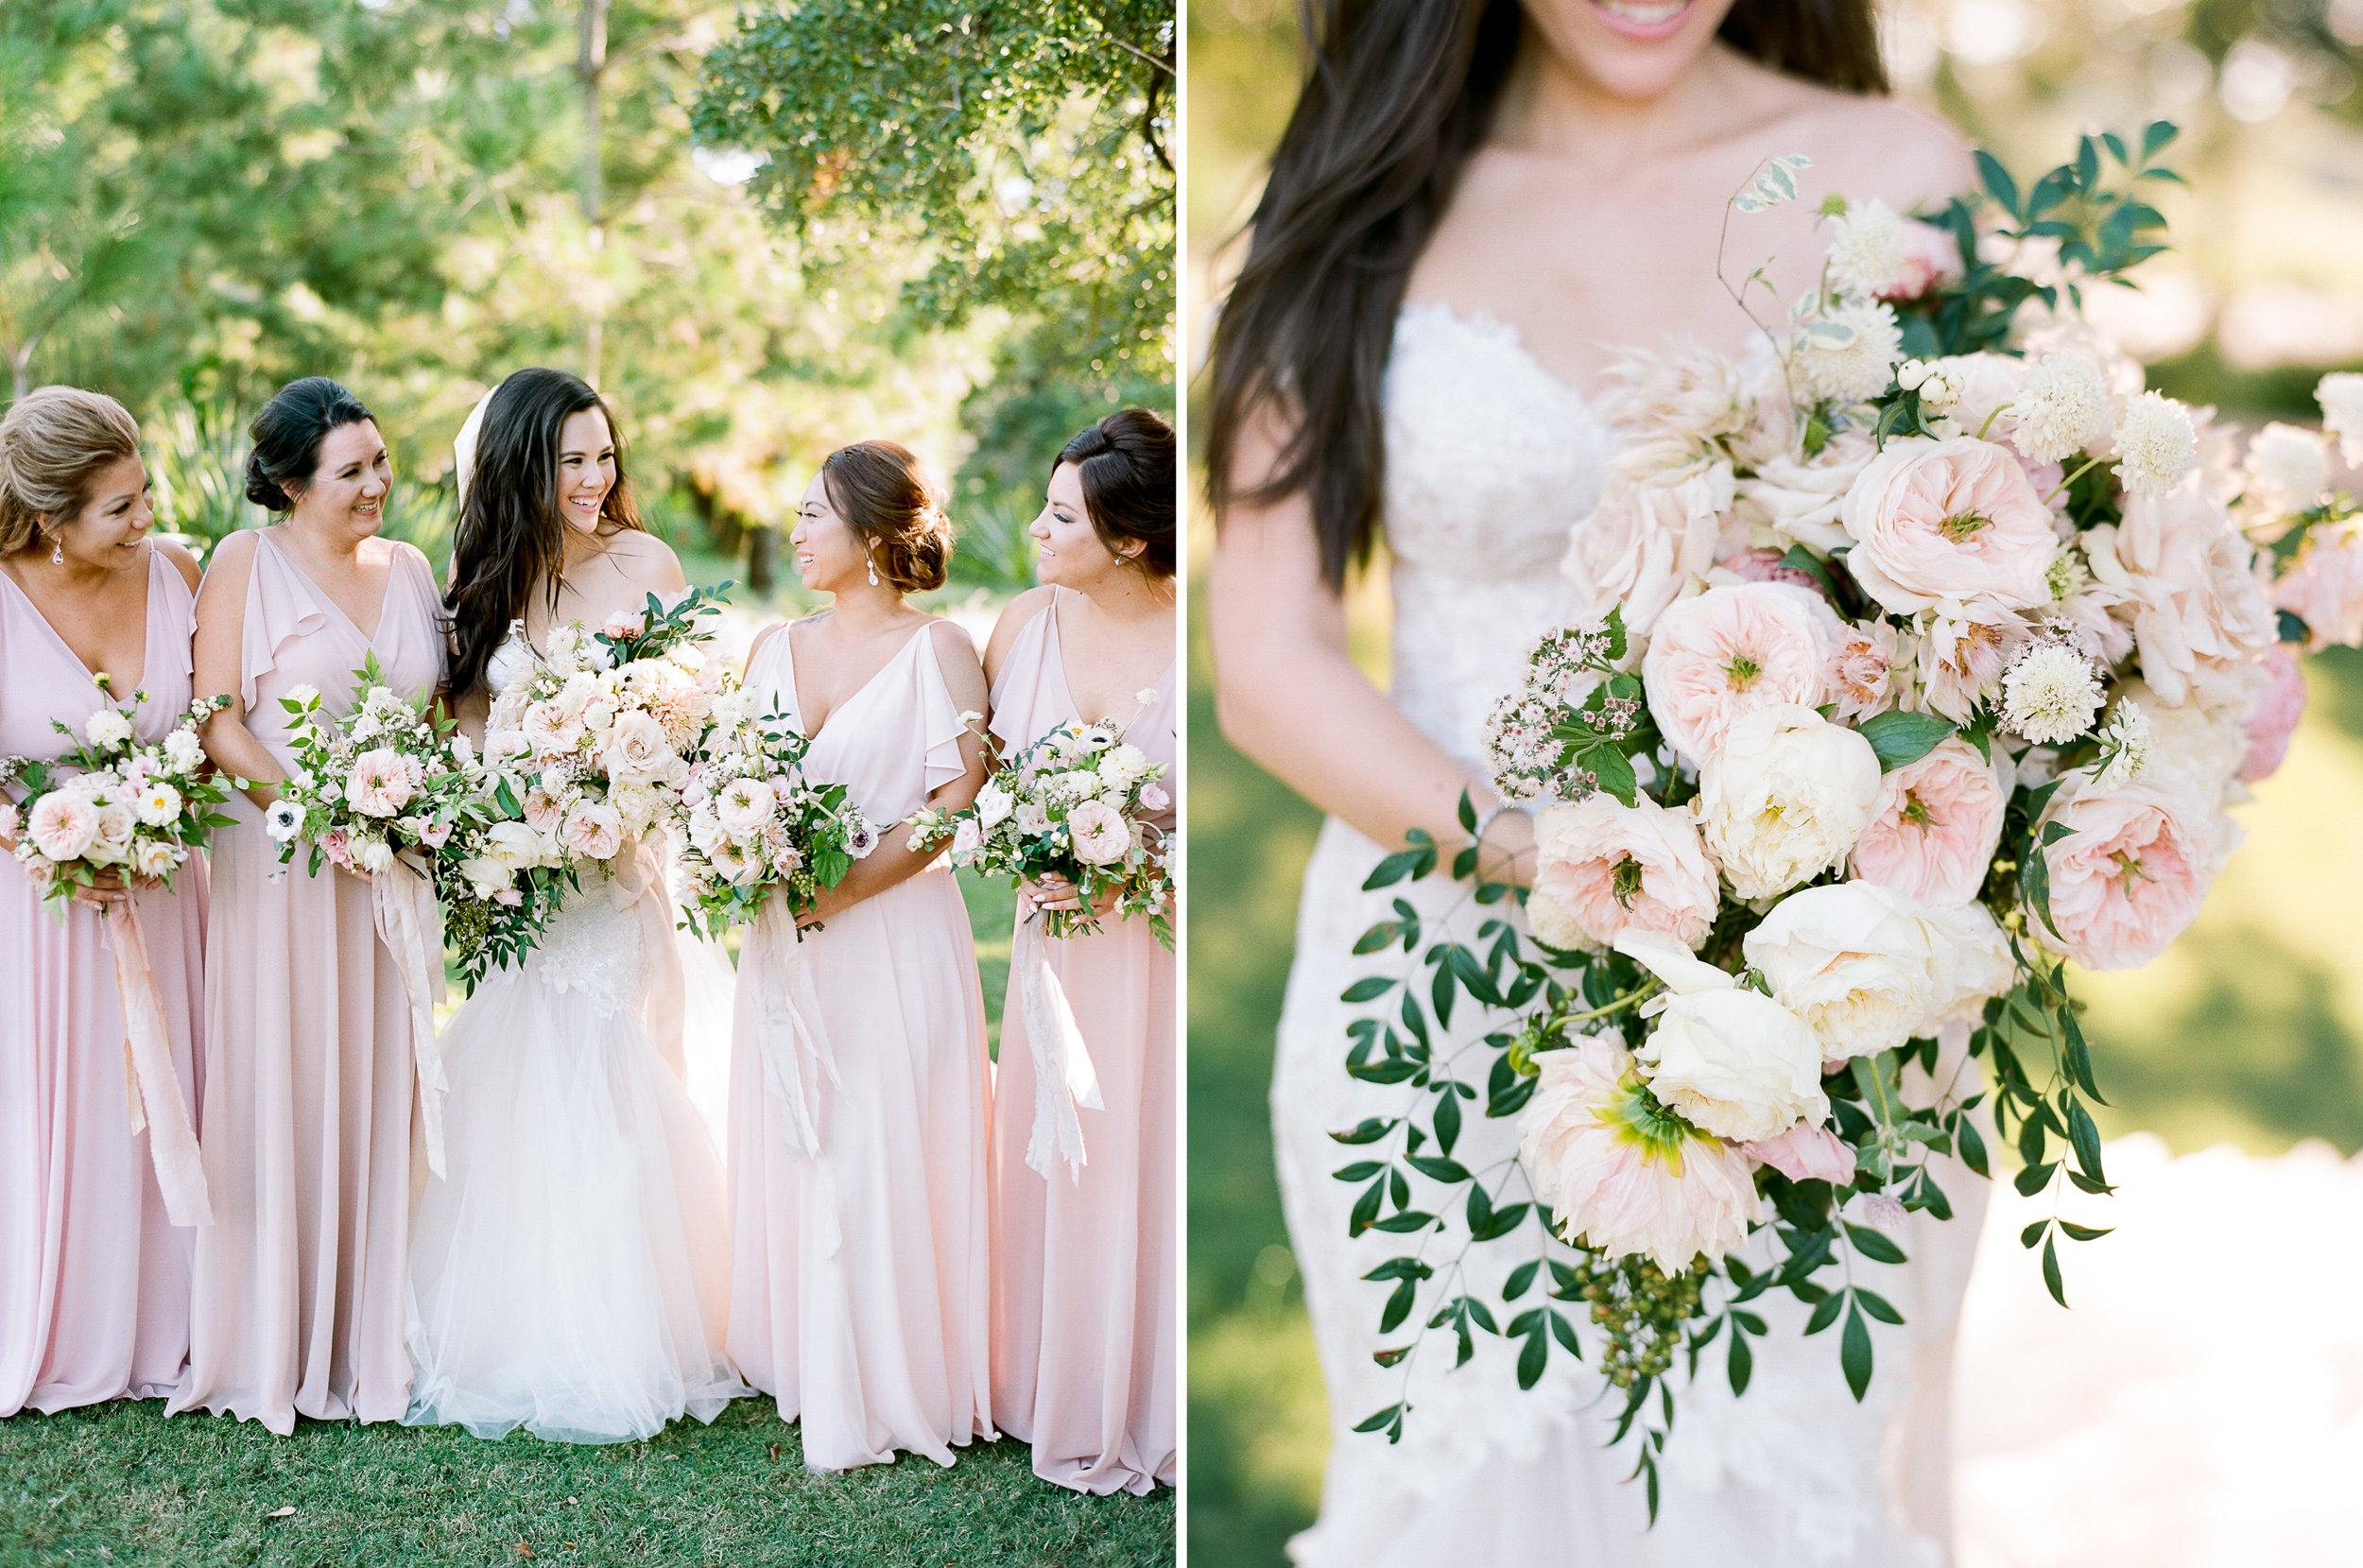 Martha-Stewart-Wedding-Dana-Fernandez-Photography-Josh-Texas-Film-Houston-Wedding-Fine-Art-Photographer-McGovern-Centennial-Gardens-Top-Best-117.jpg